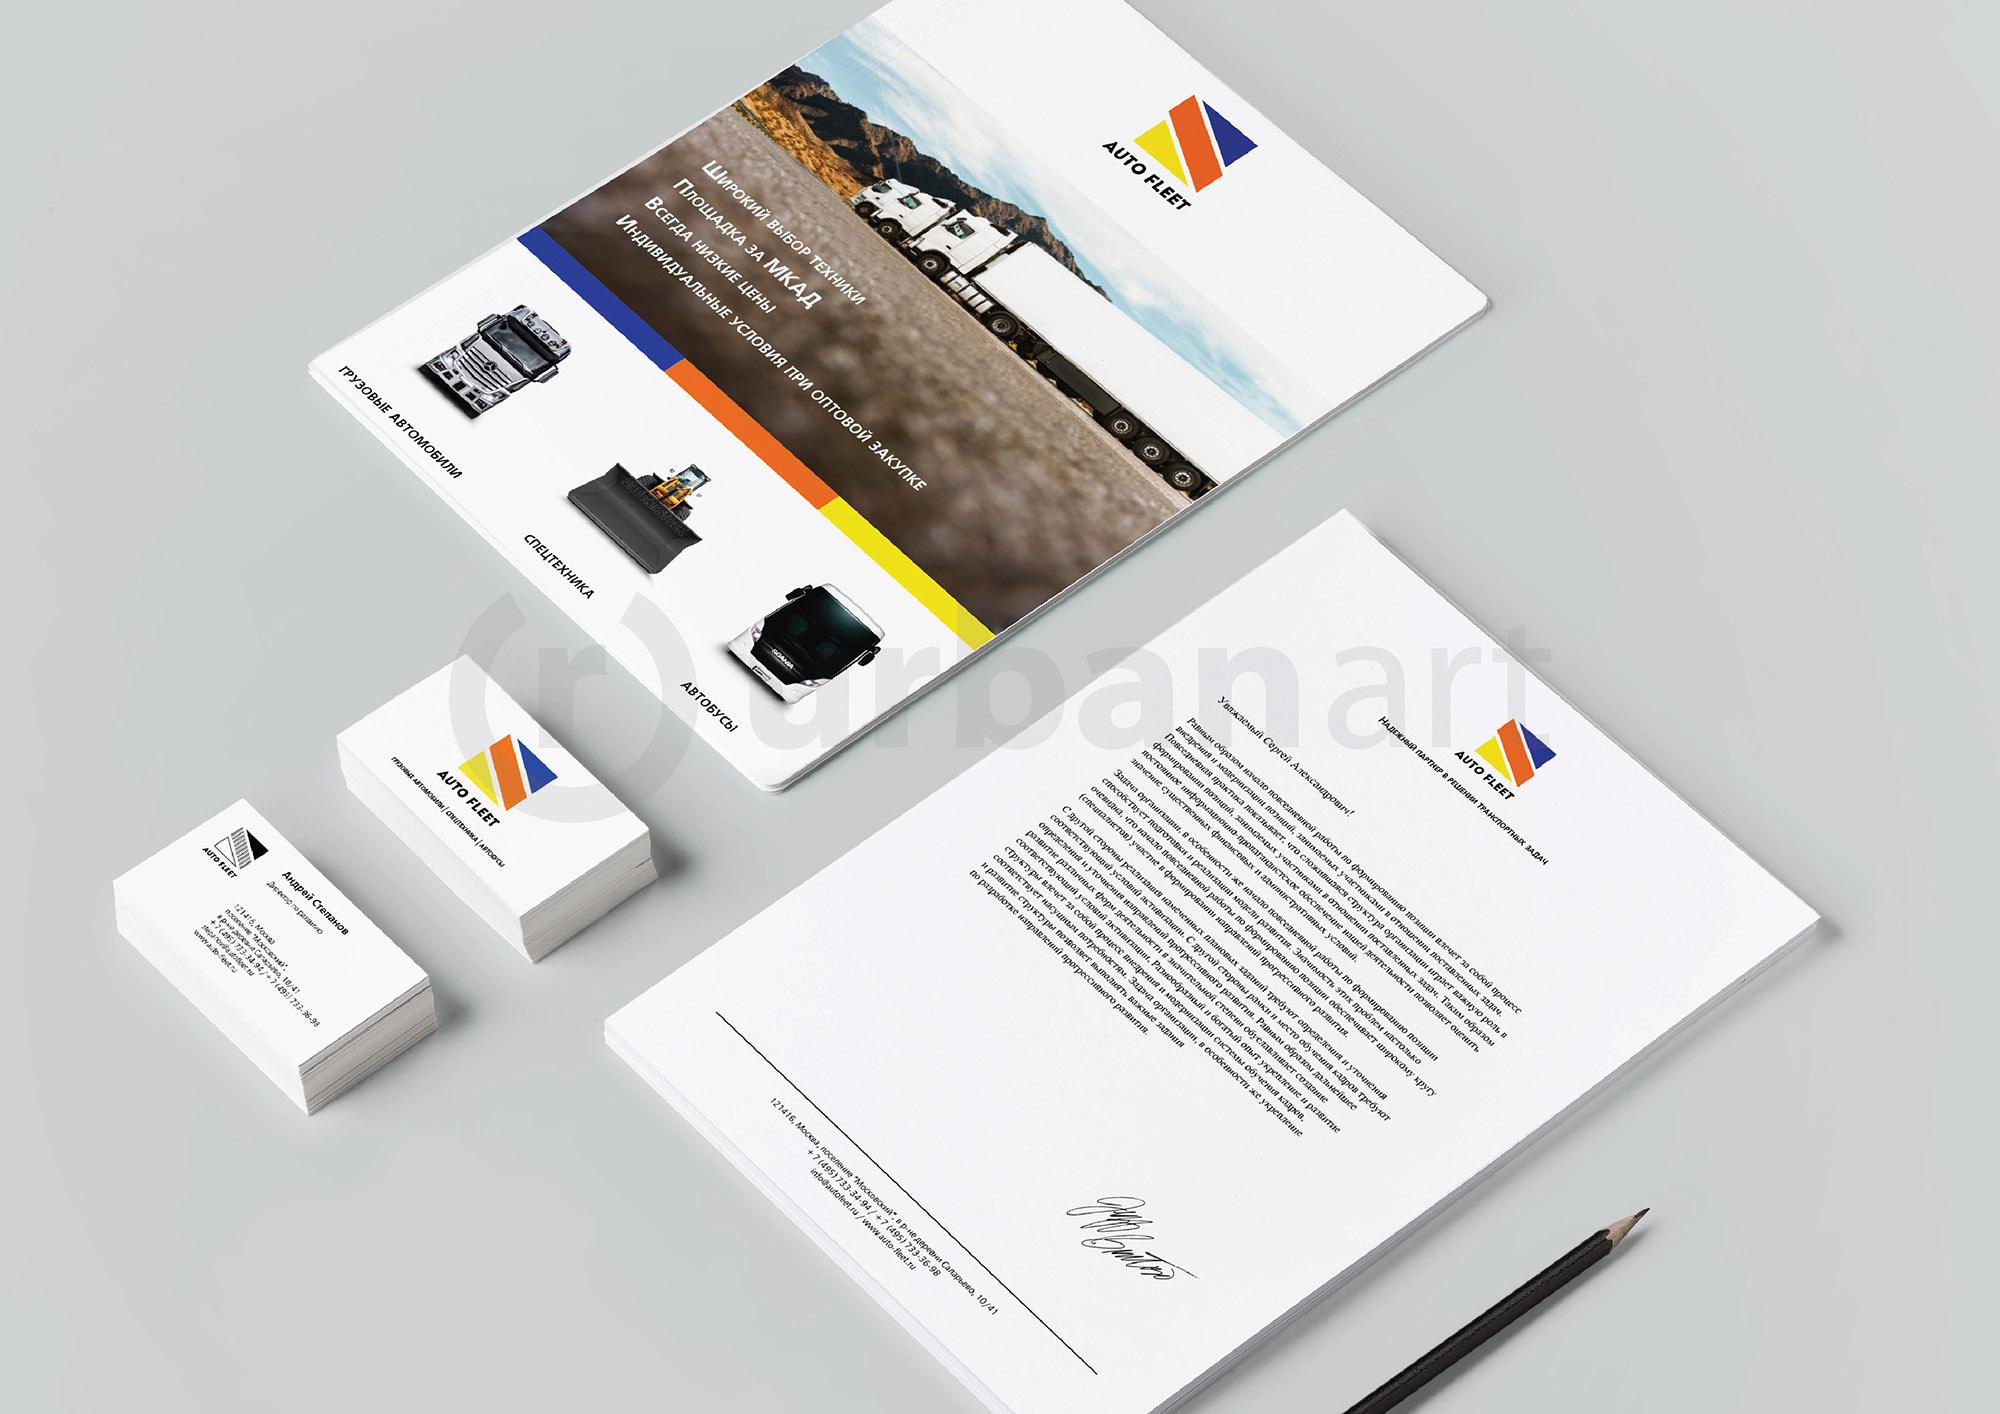 дизайн каталога, визитки, бланка